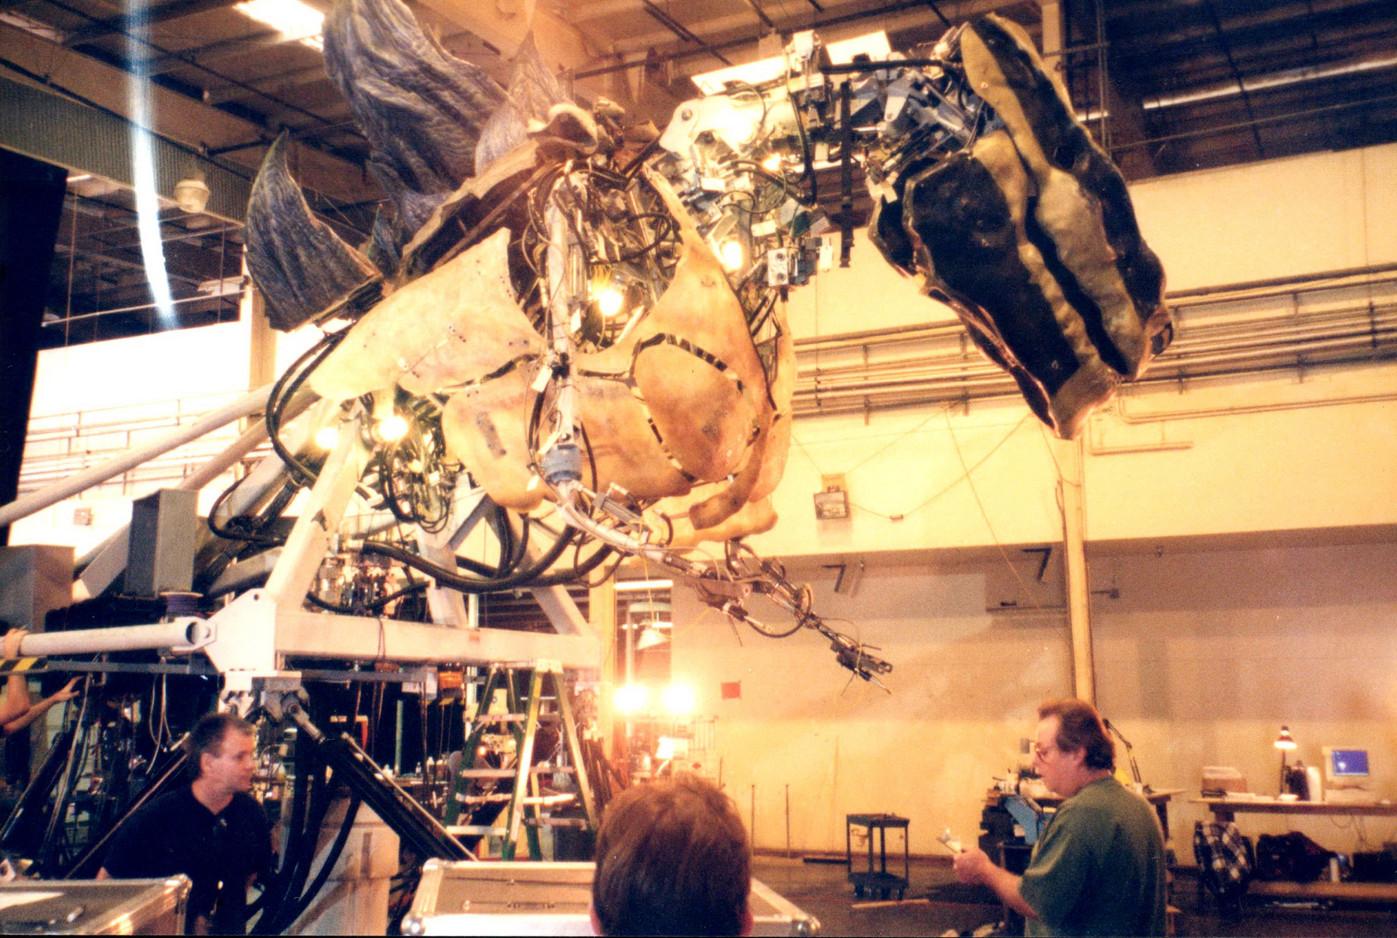 6th scale Godzilla upper Torso at Patrick Tatopoulos' workshop